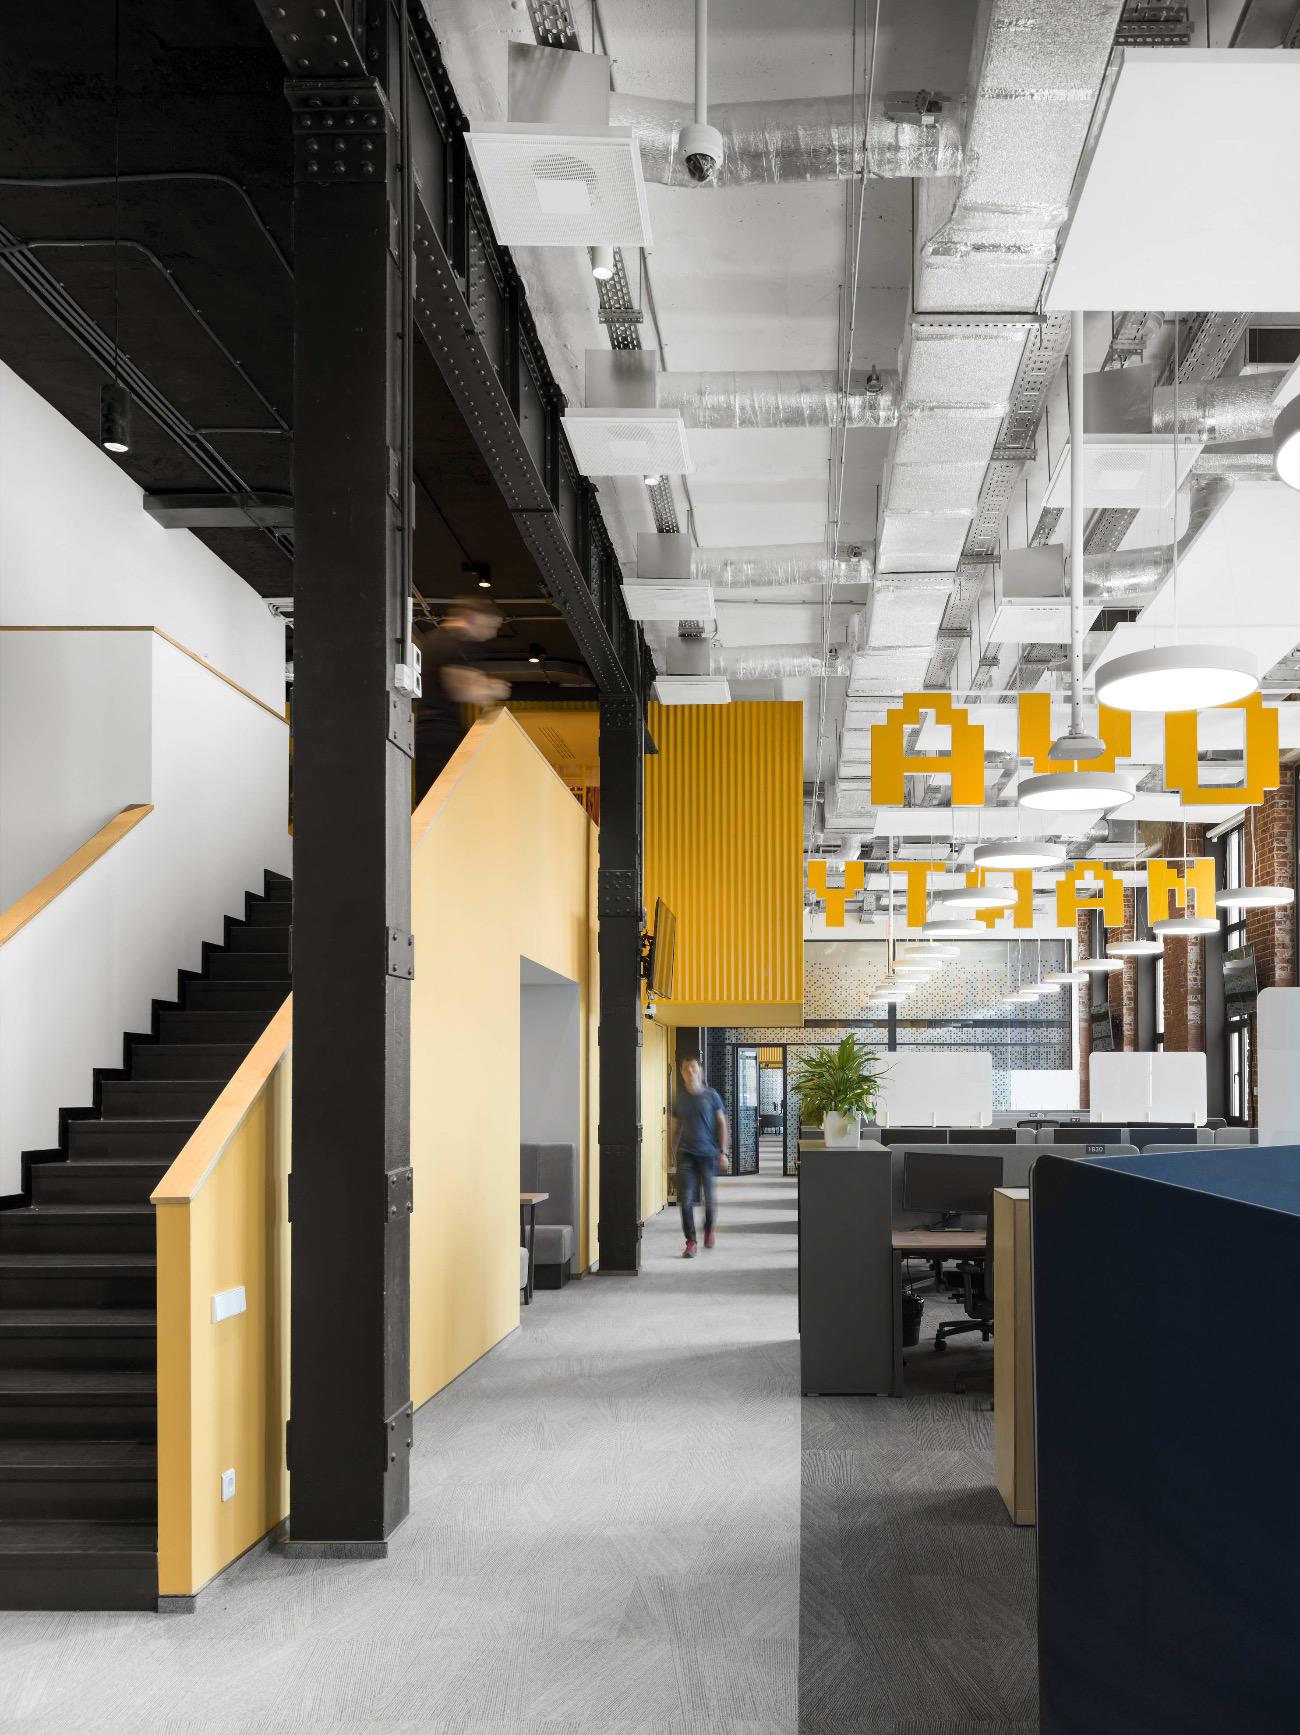 raifeissen-omsk-office-45